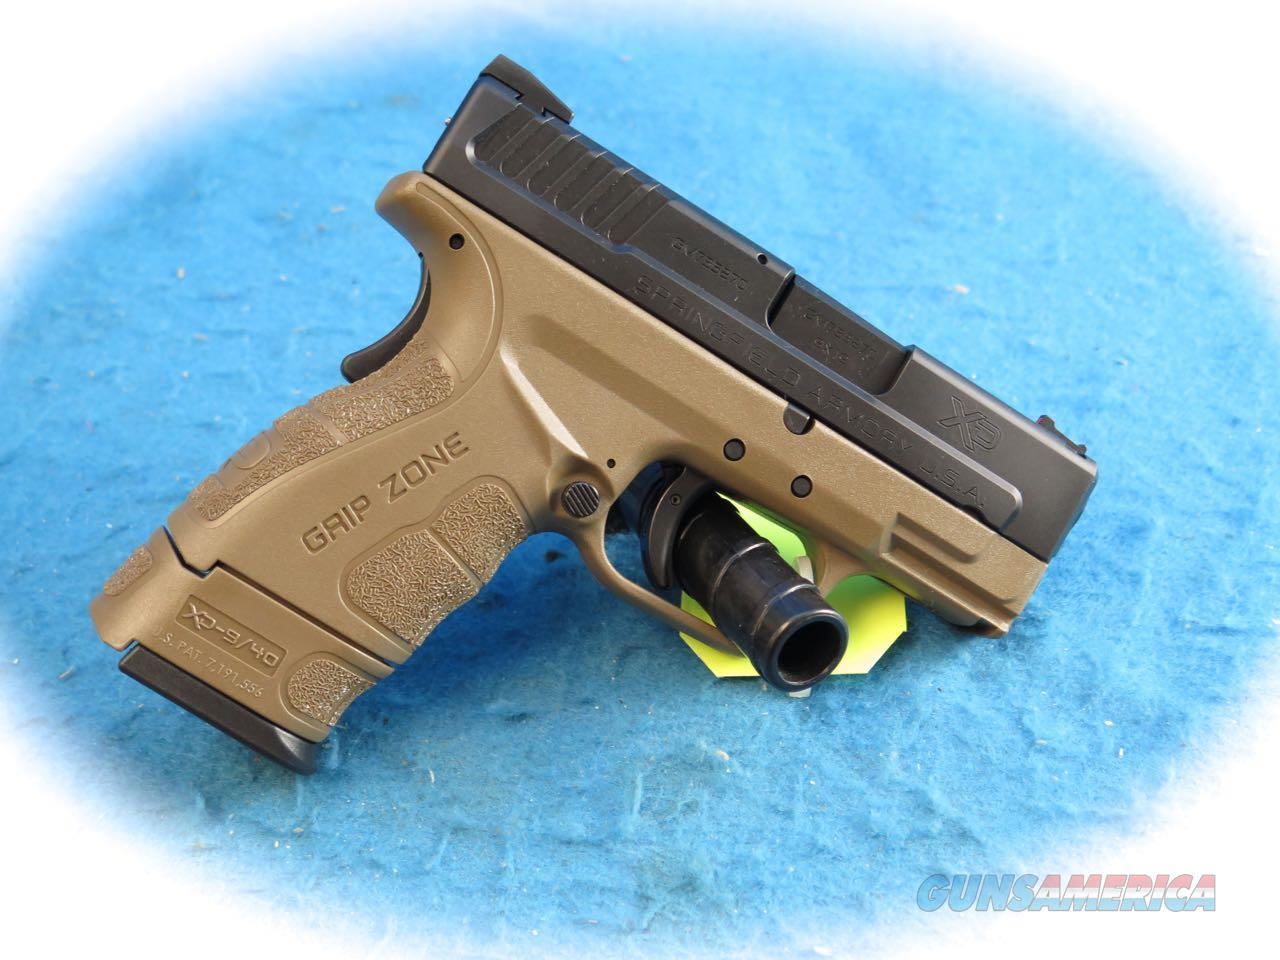 Springfield Armory XD Mod 2 Sub-Compact 9mm Pistol FDE Model XDG9801FDEHC **New**  Guns > Pistols > Springfield Armory Pistols > XD-Mod.2